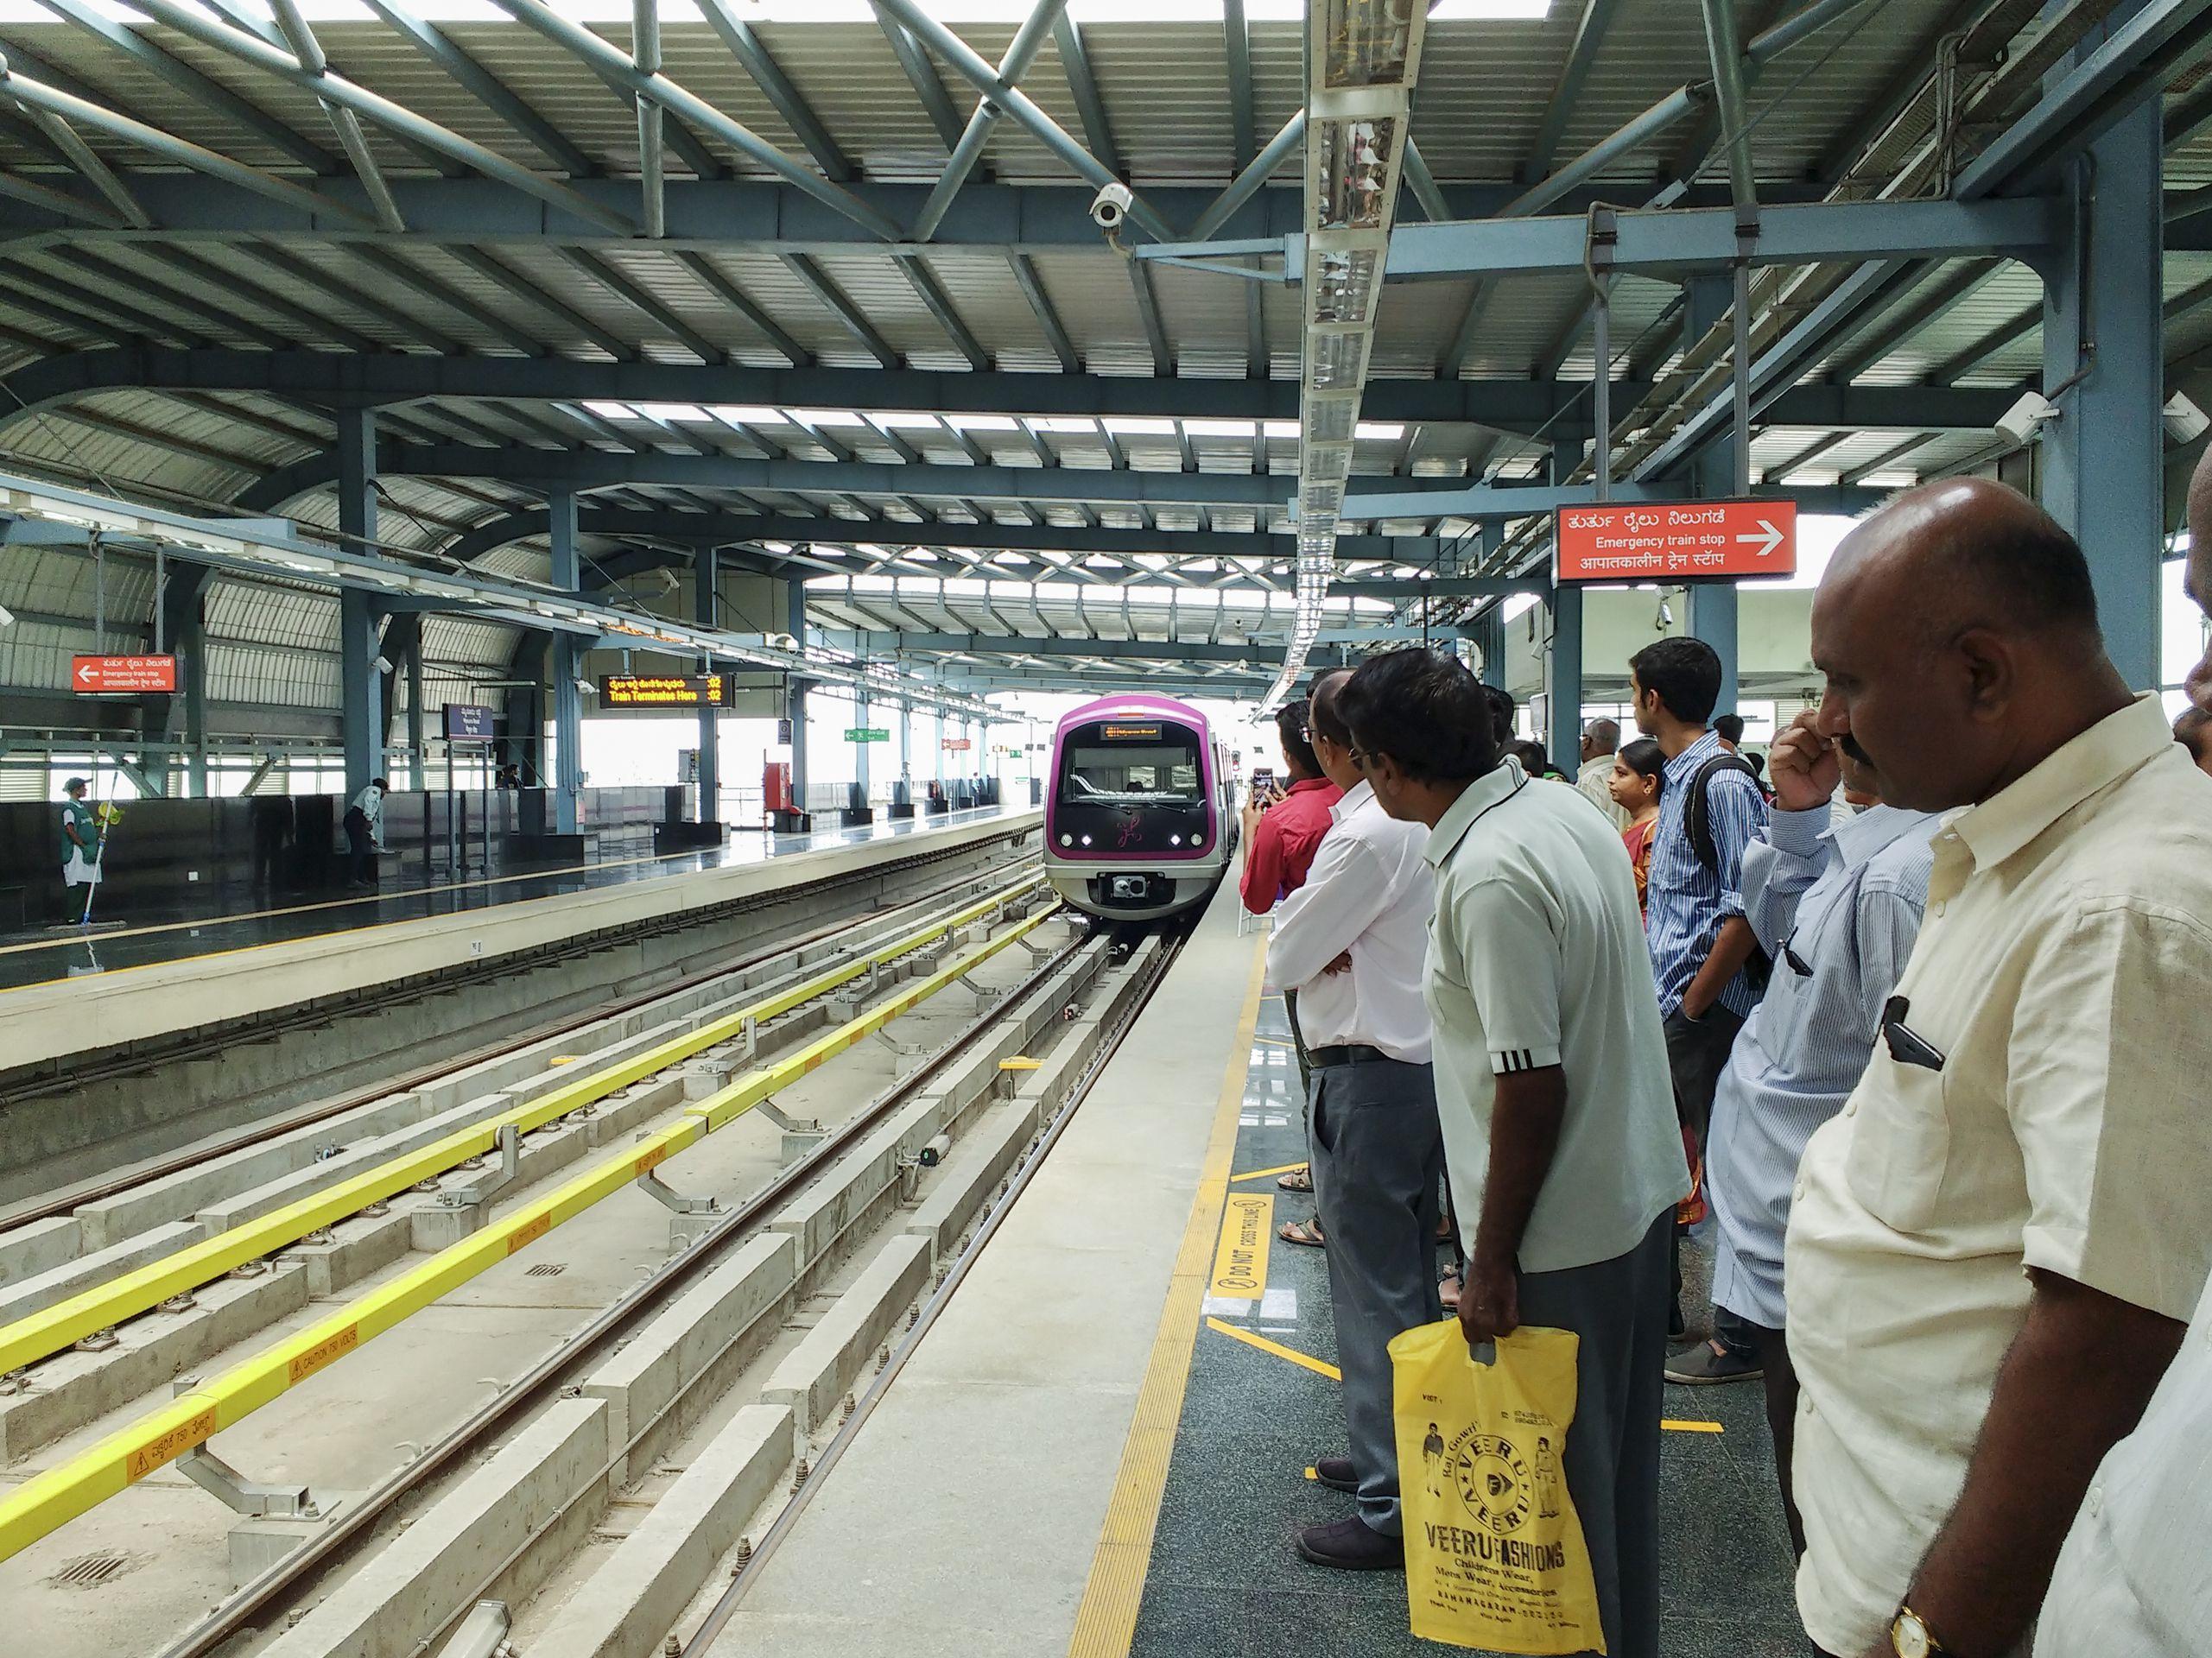 Bangalore Metro Train: What You Need to Know